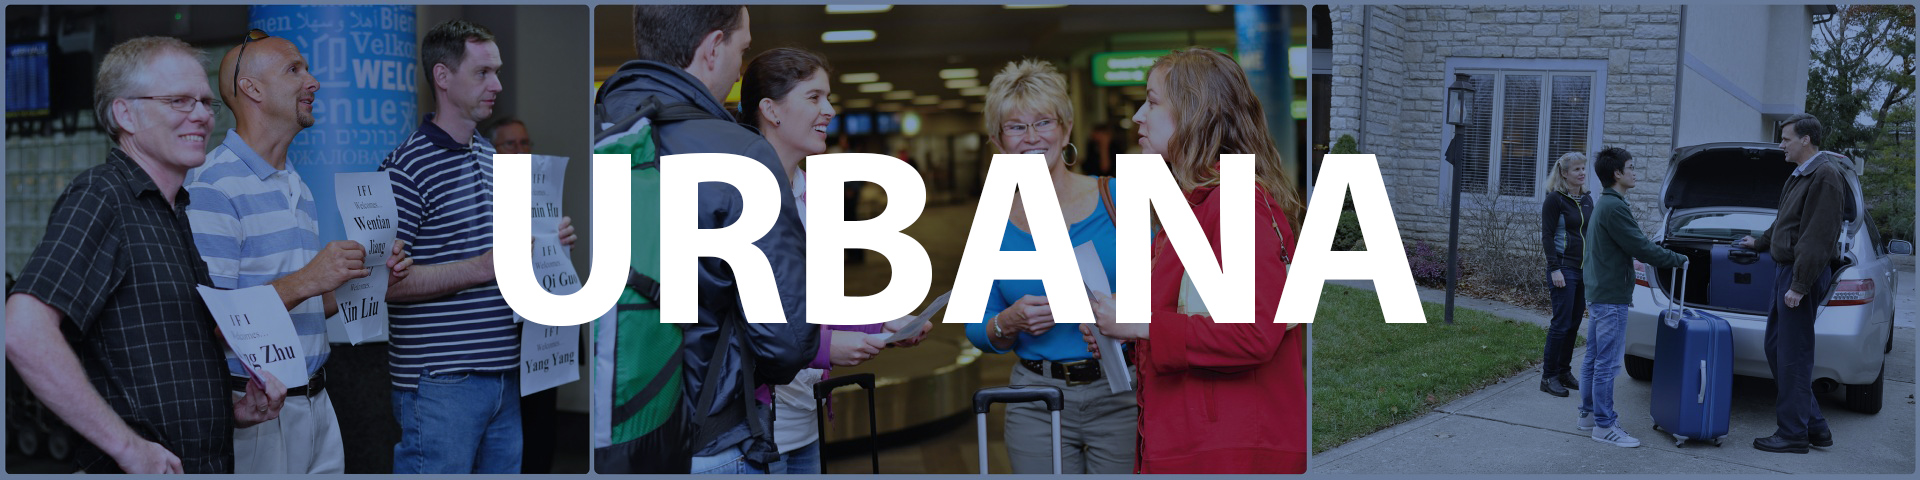 banner-image-2-urbana